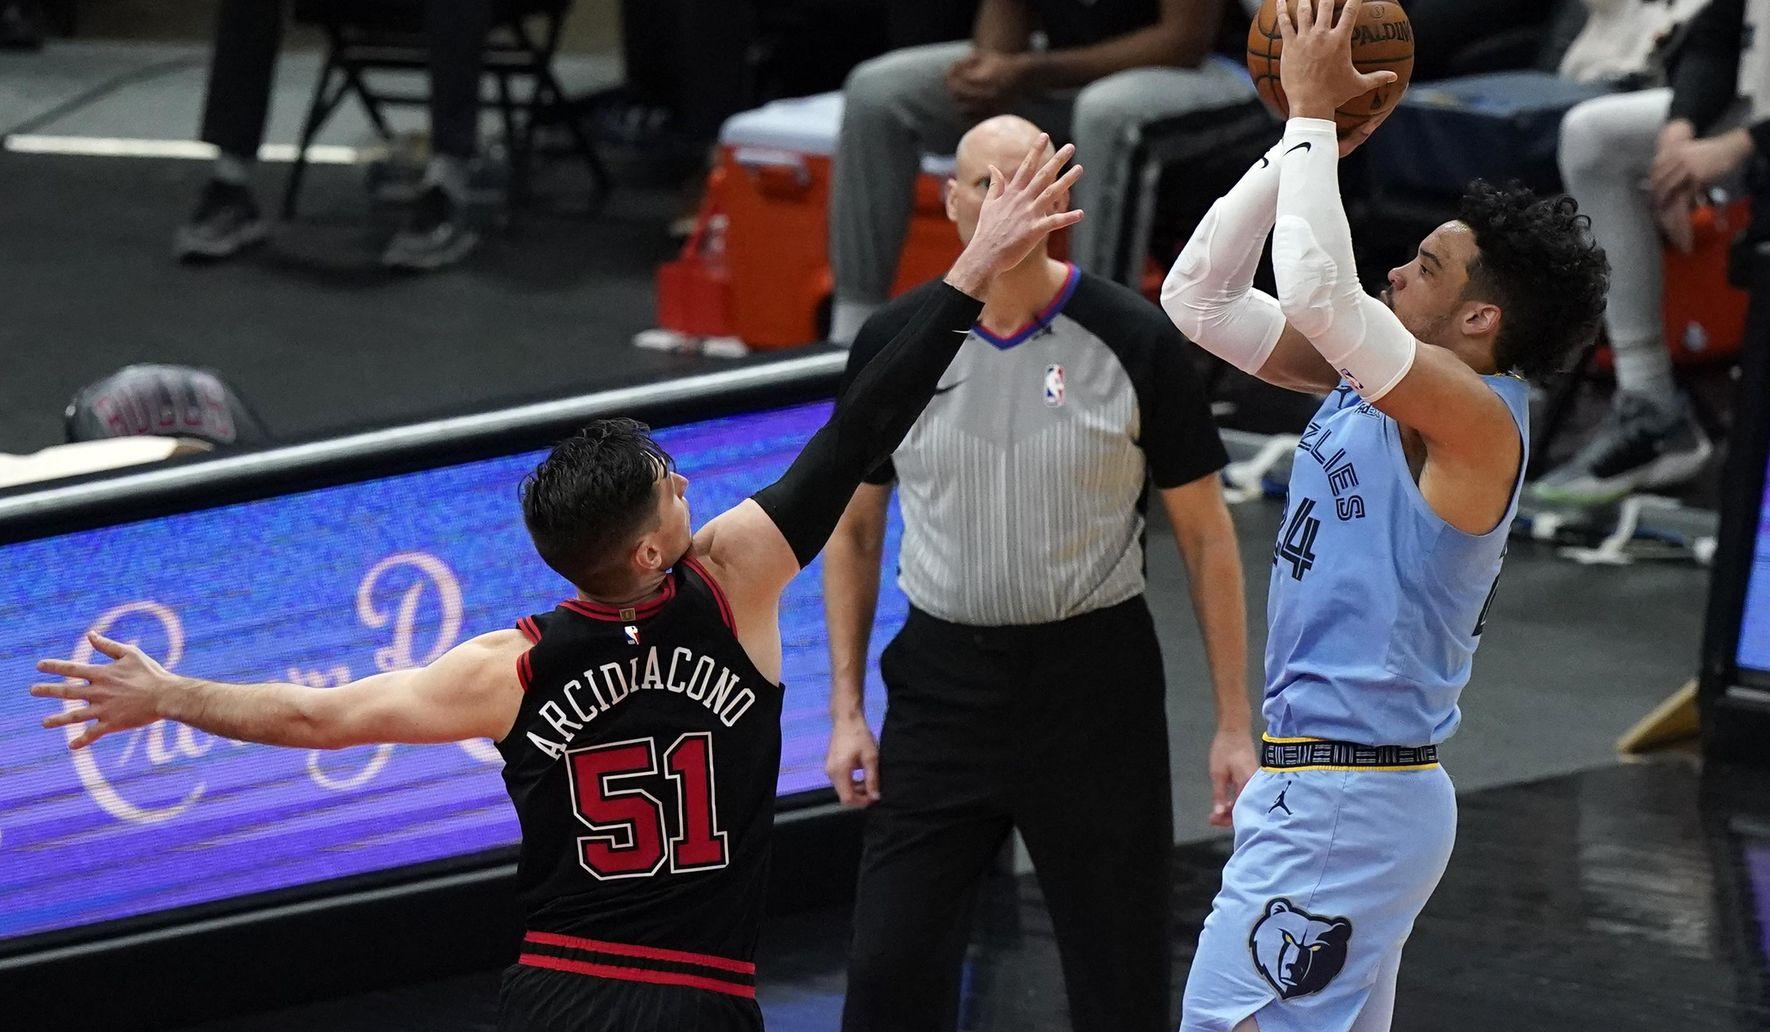 Grizzlies_bulls_basketball_04101_c0-126-3029-1892_s1770x1032